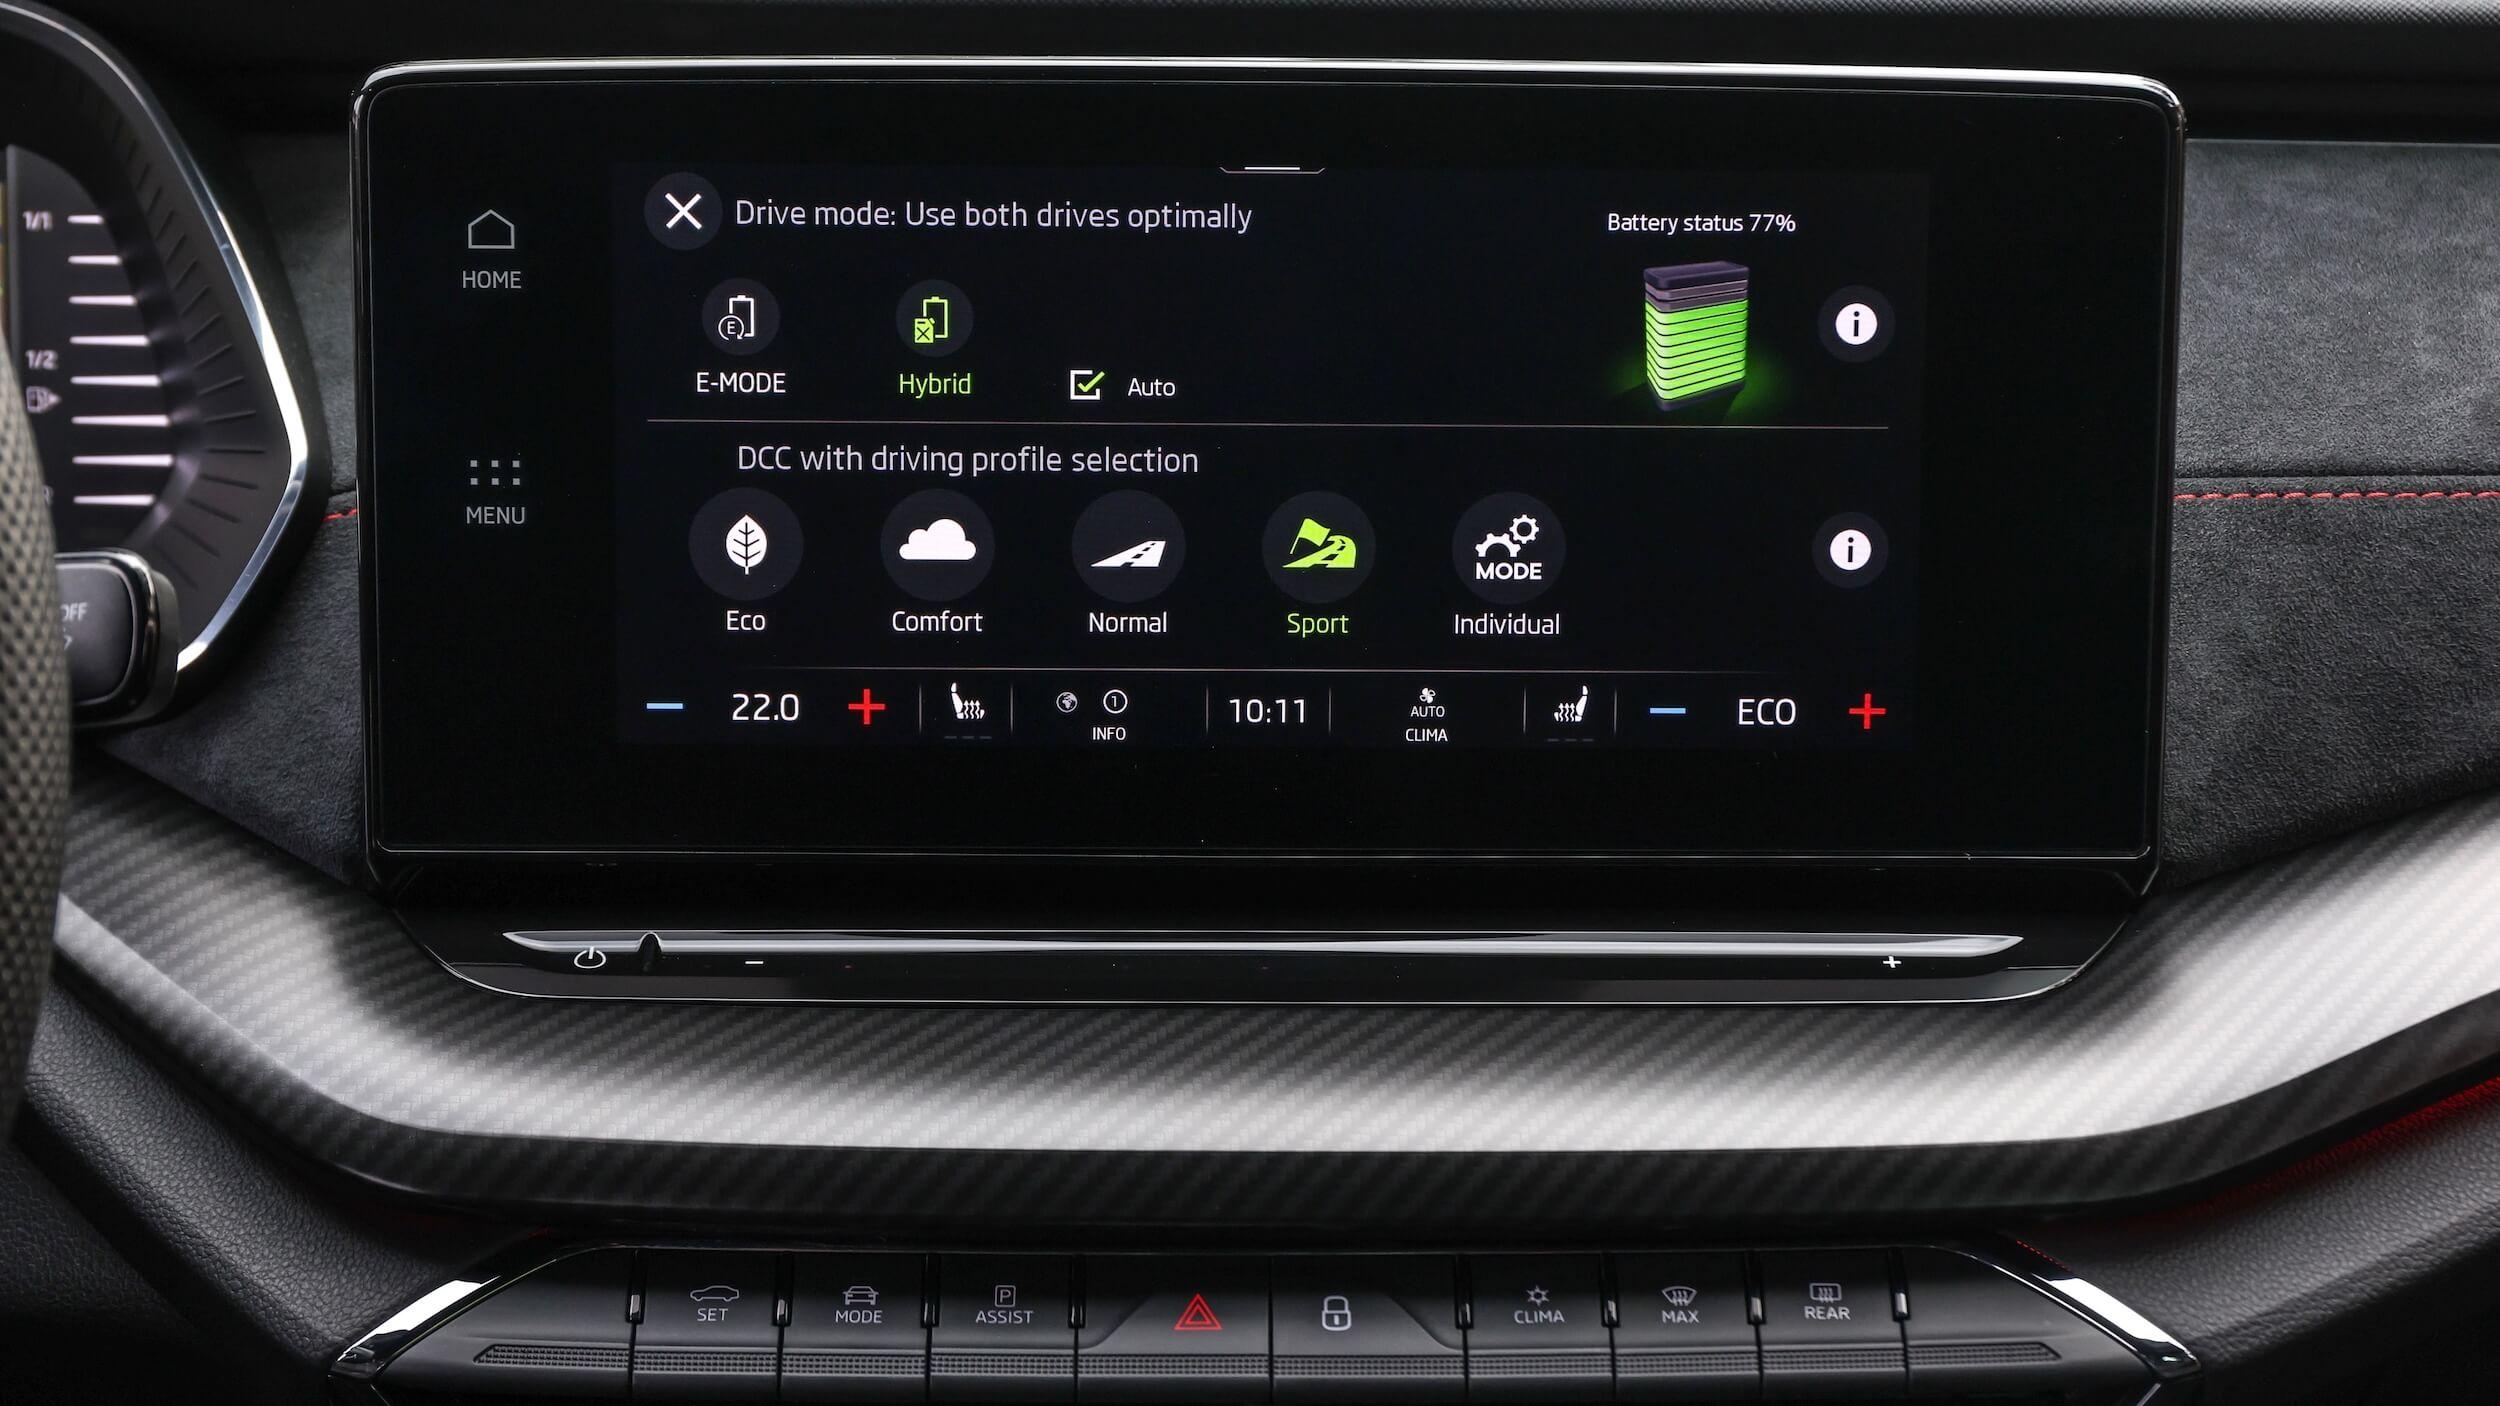 Skoda Octavia Combi RS iV Mk4 infotainment